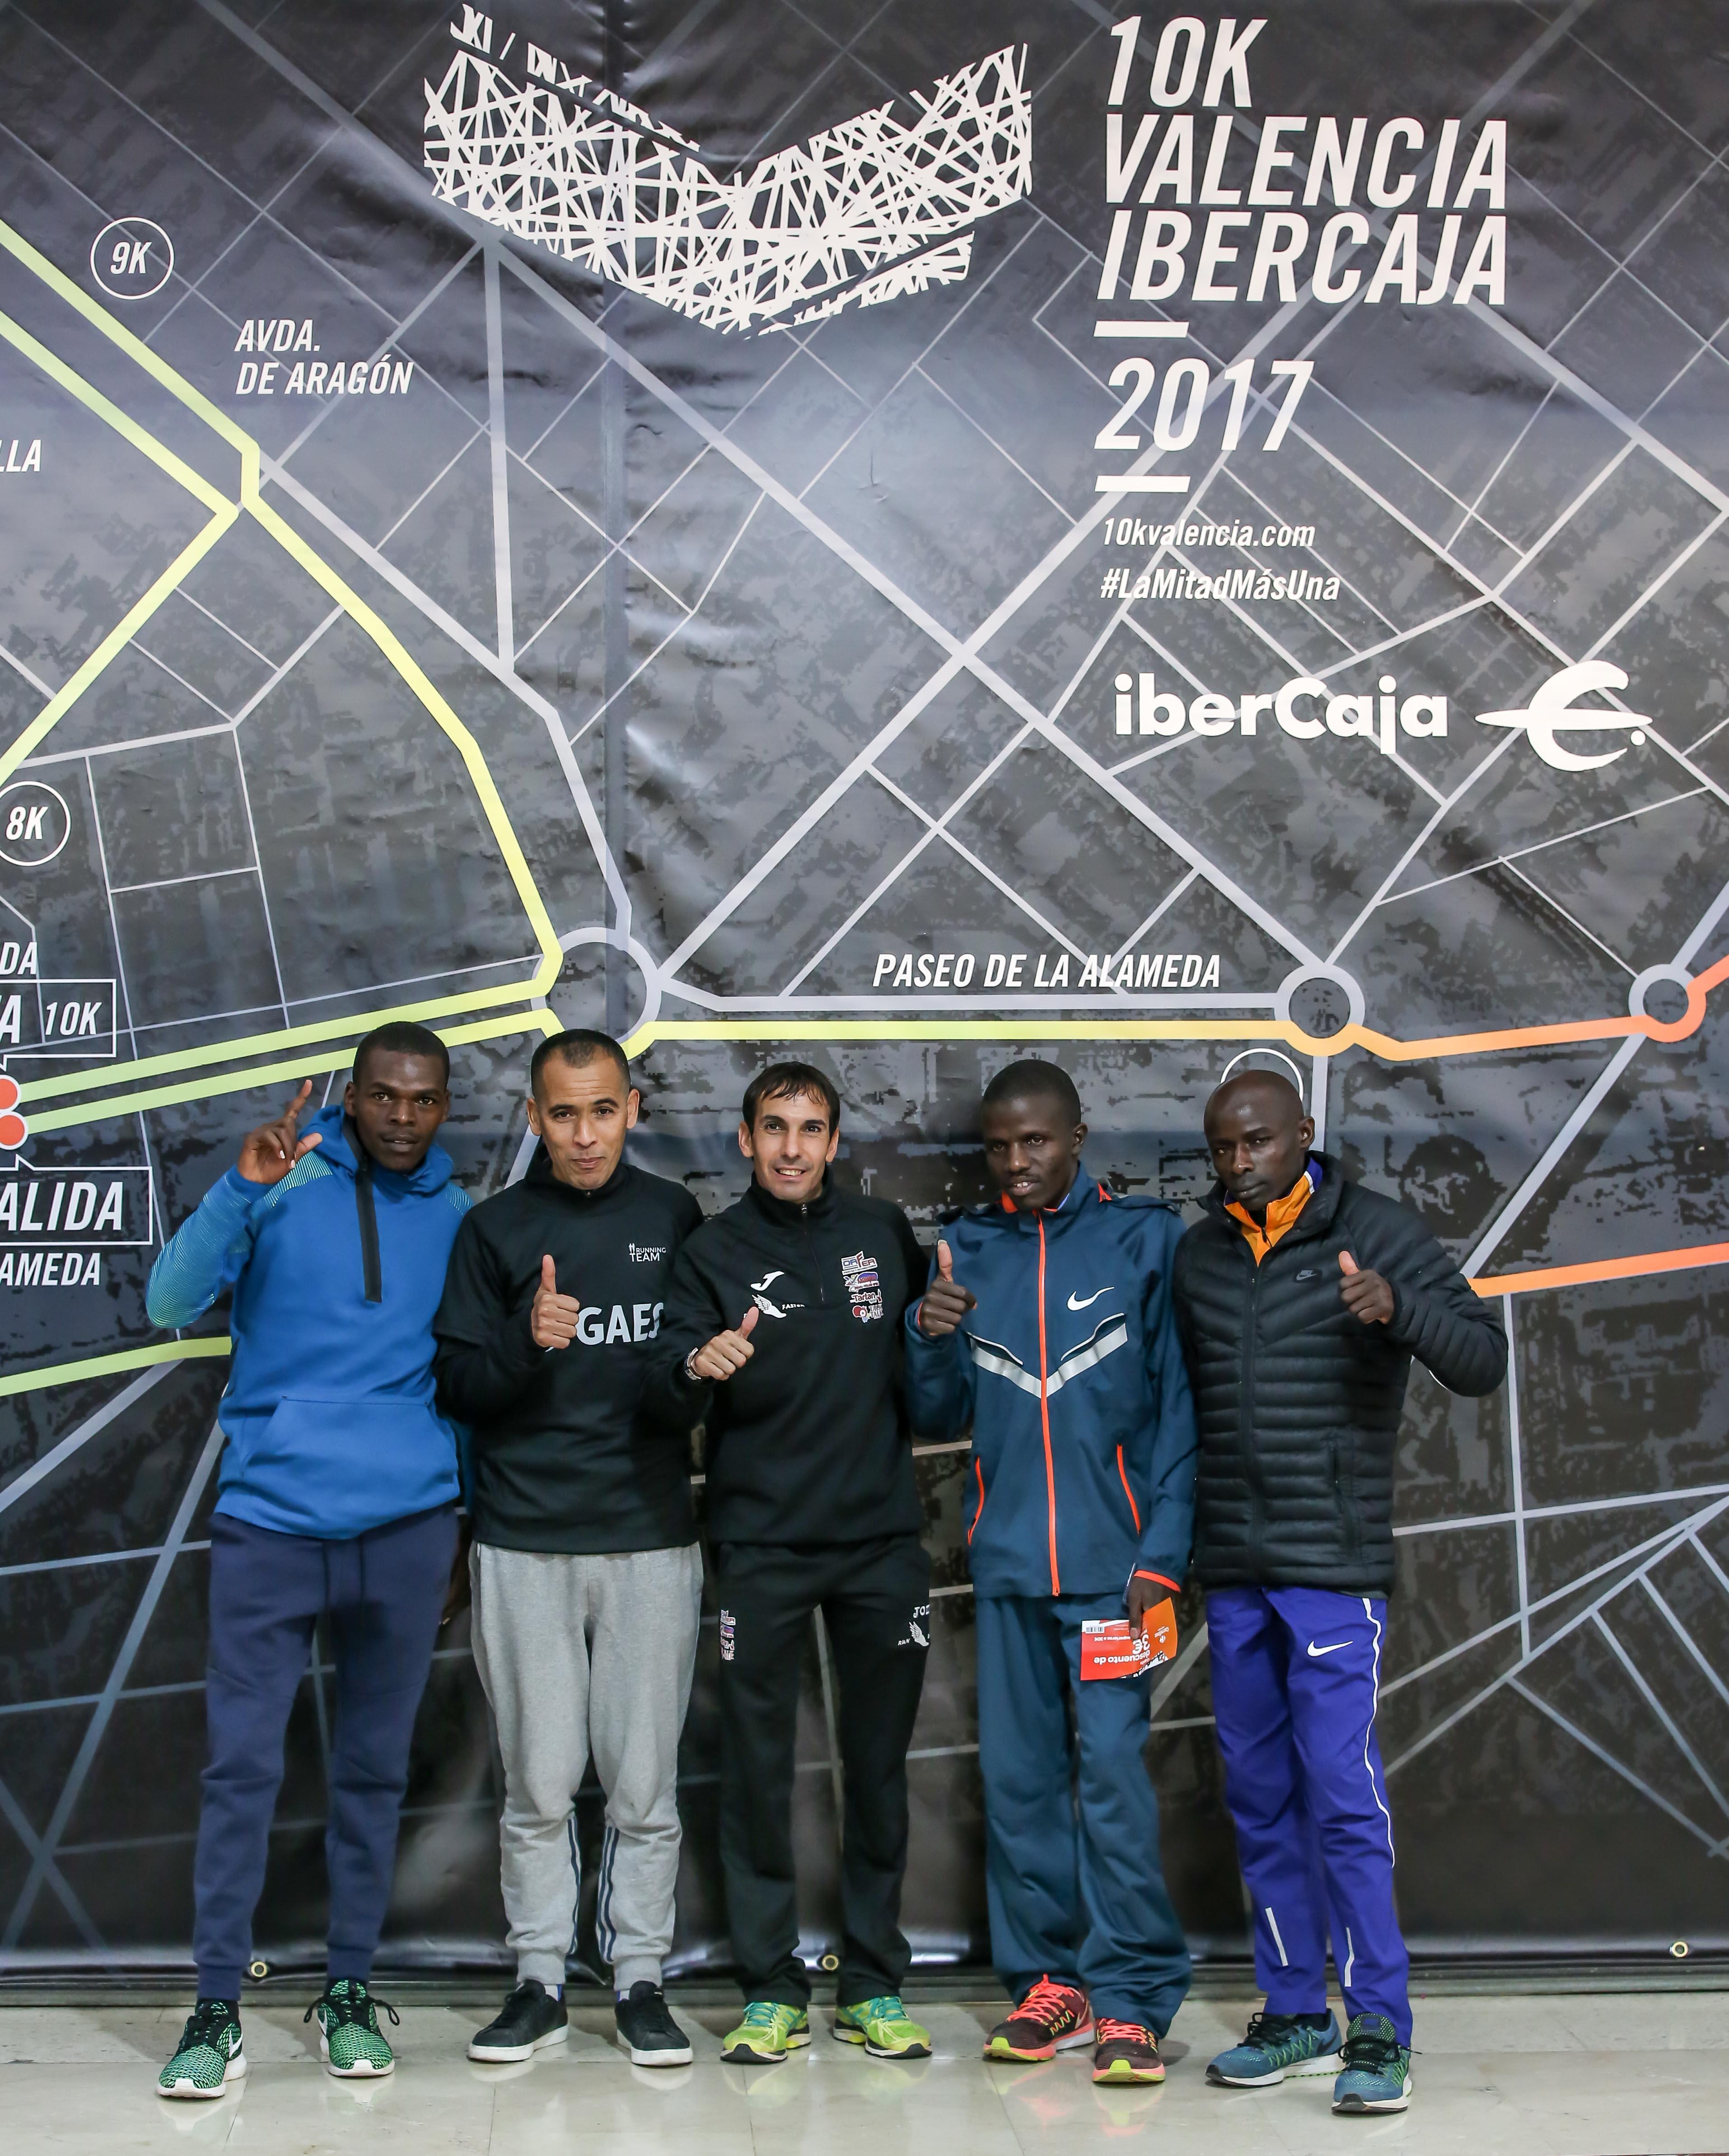 Grupo de Élite - 10K Valencia Ibercaja 2017